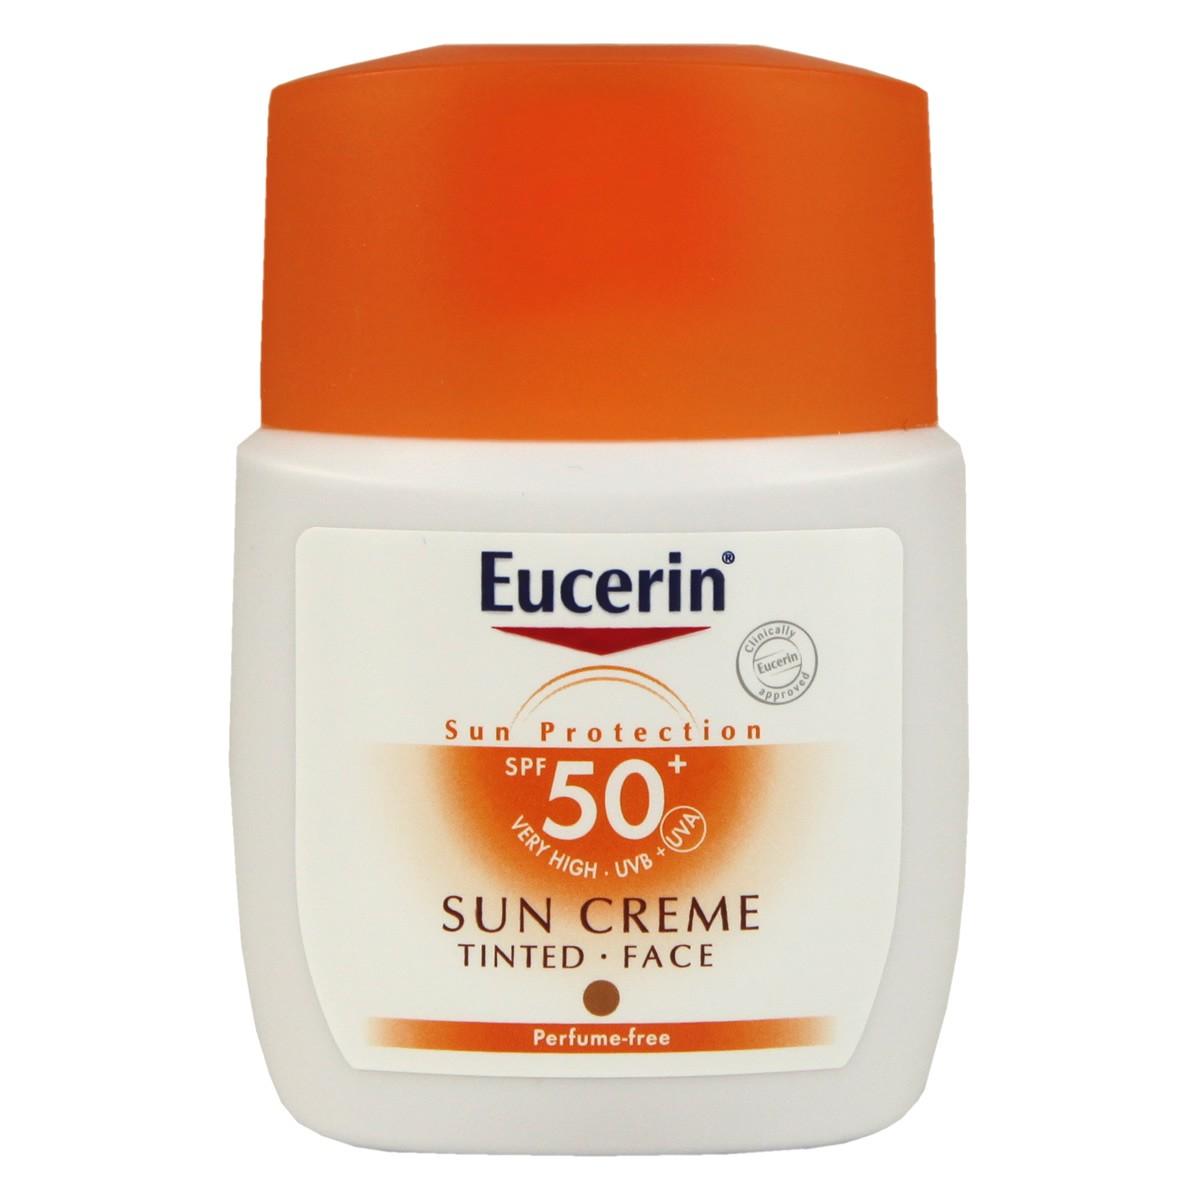 Eucerin Sun Creme Tinted SPF 50+